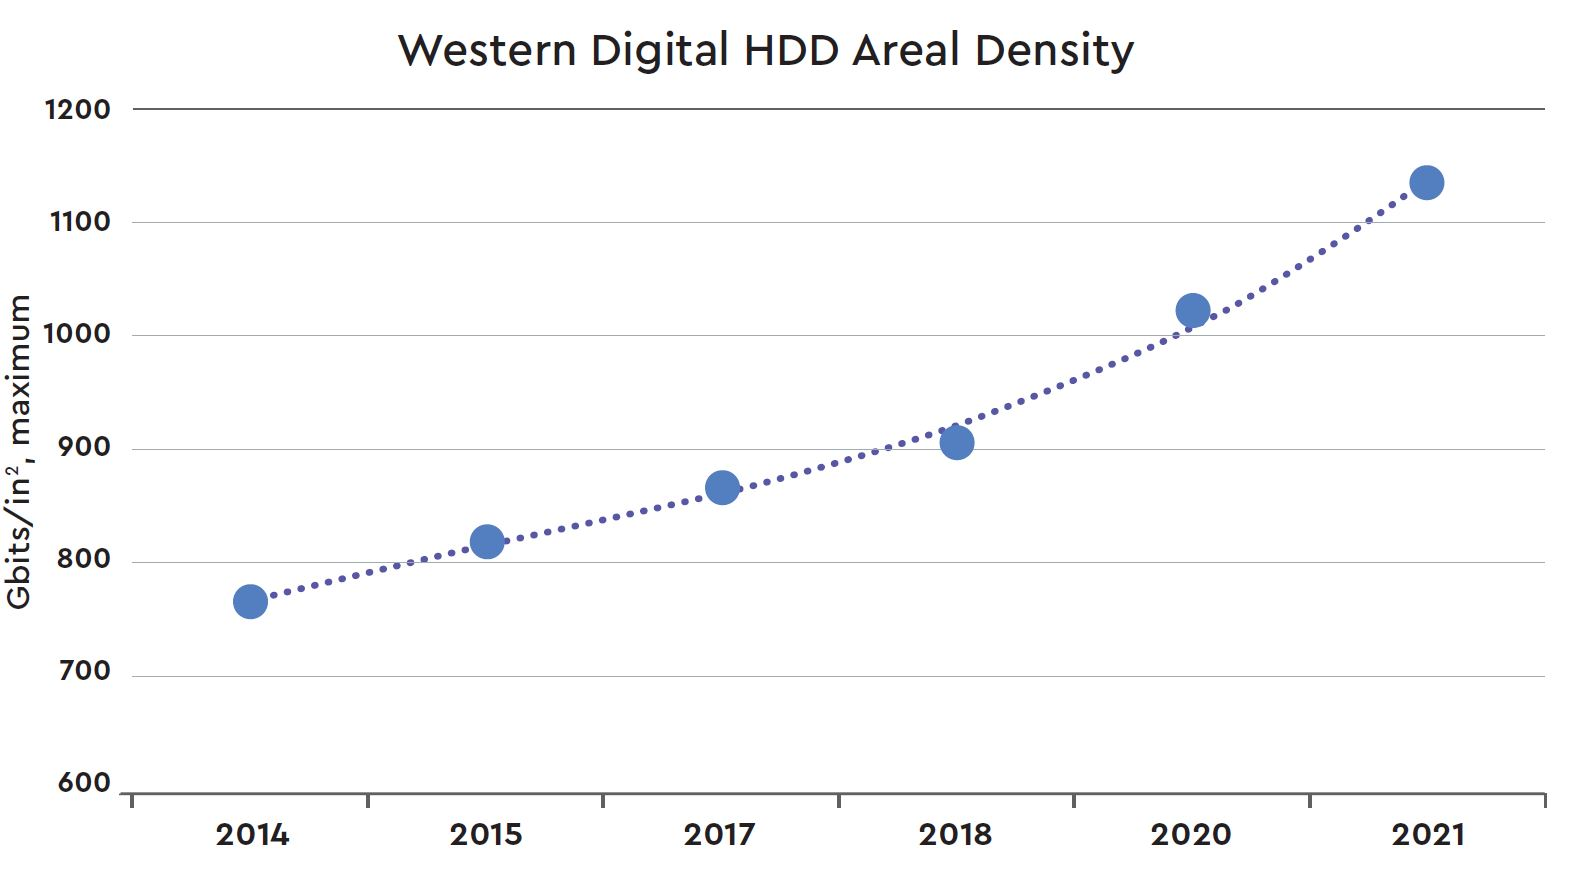 Western Digital HDD Areal Density